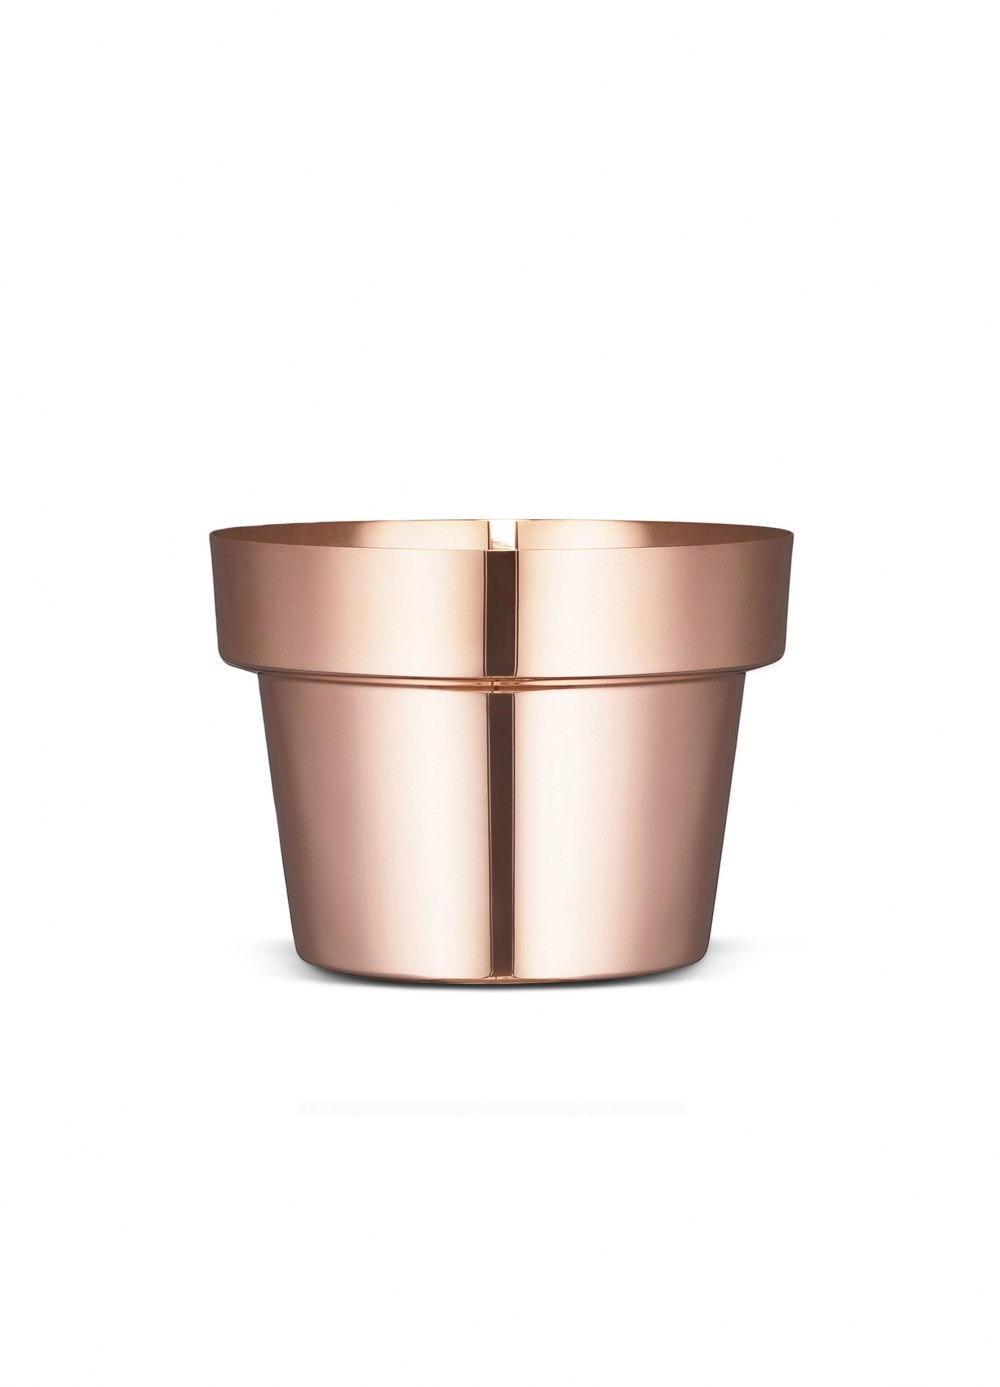 SKULTUNA Flower Pot Polished Copper Small DFE169067